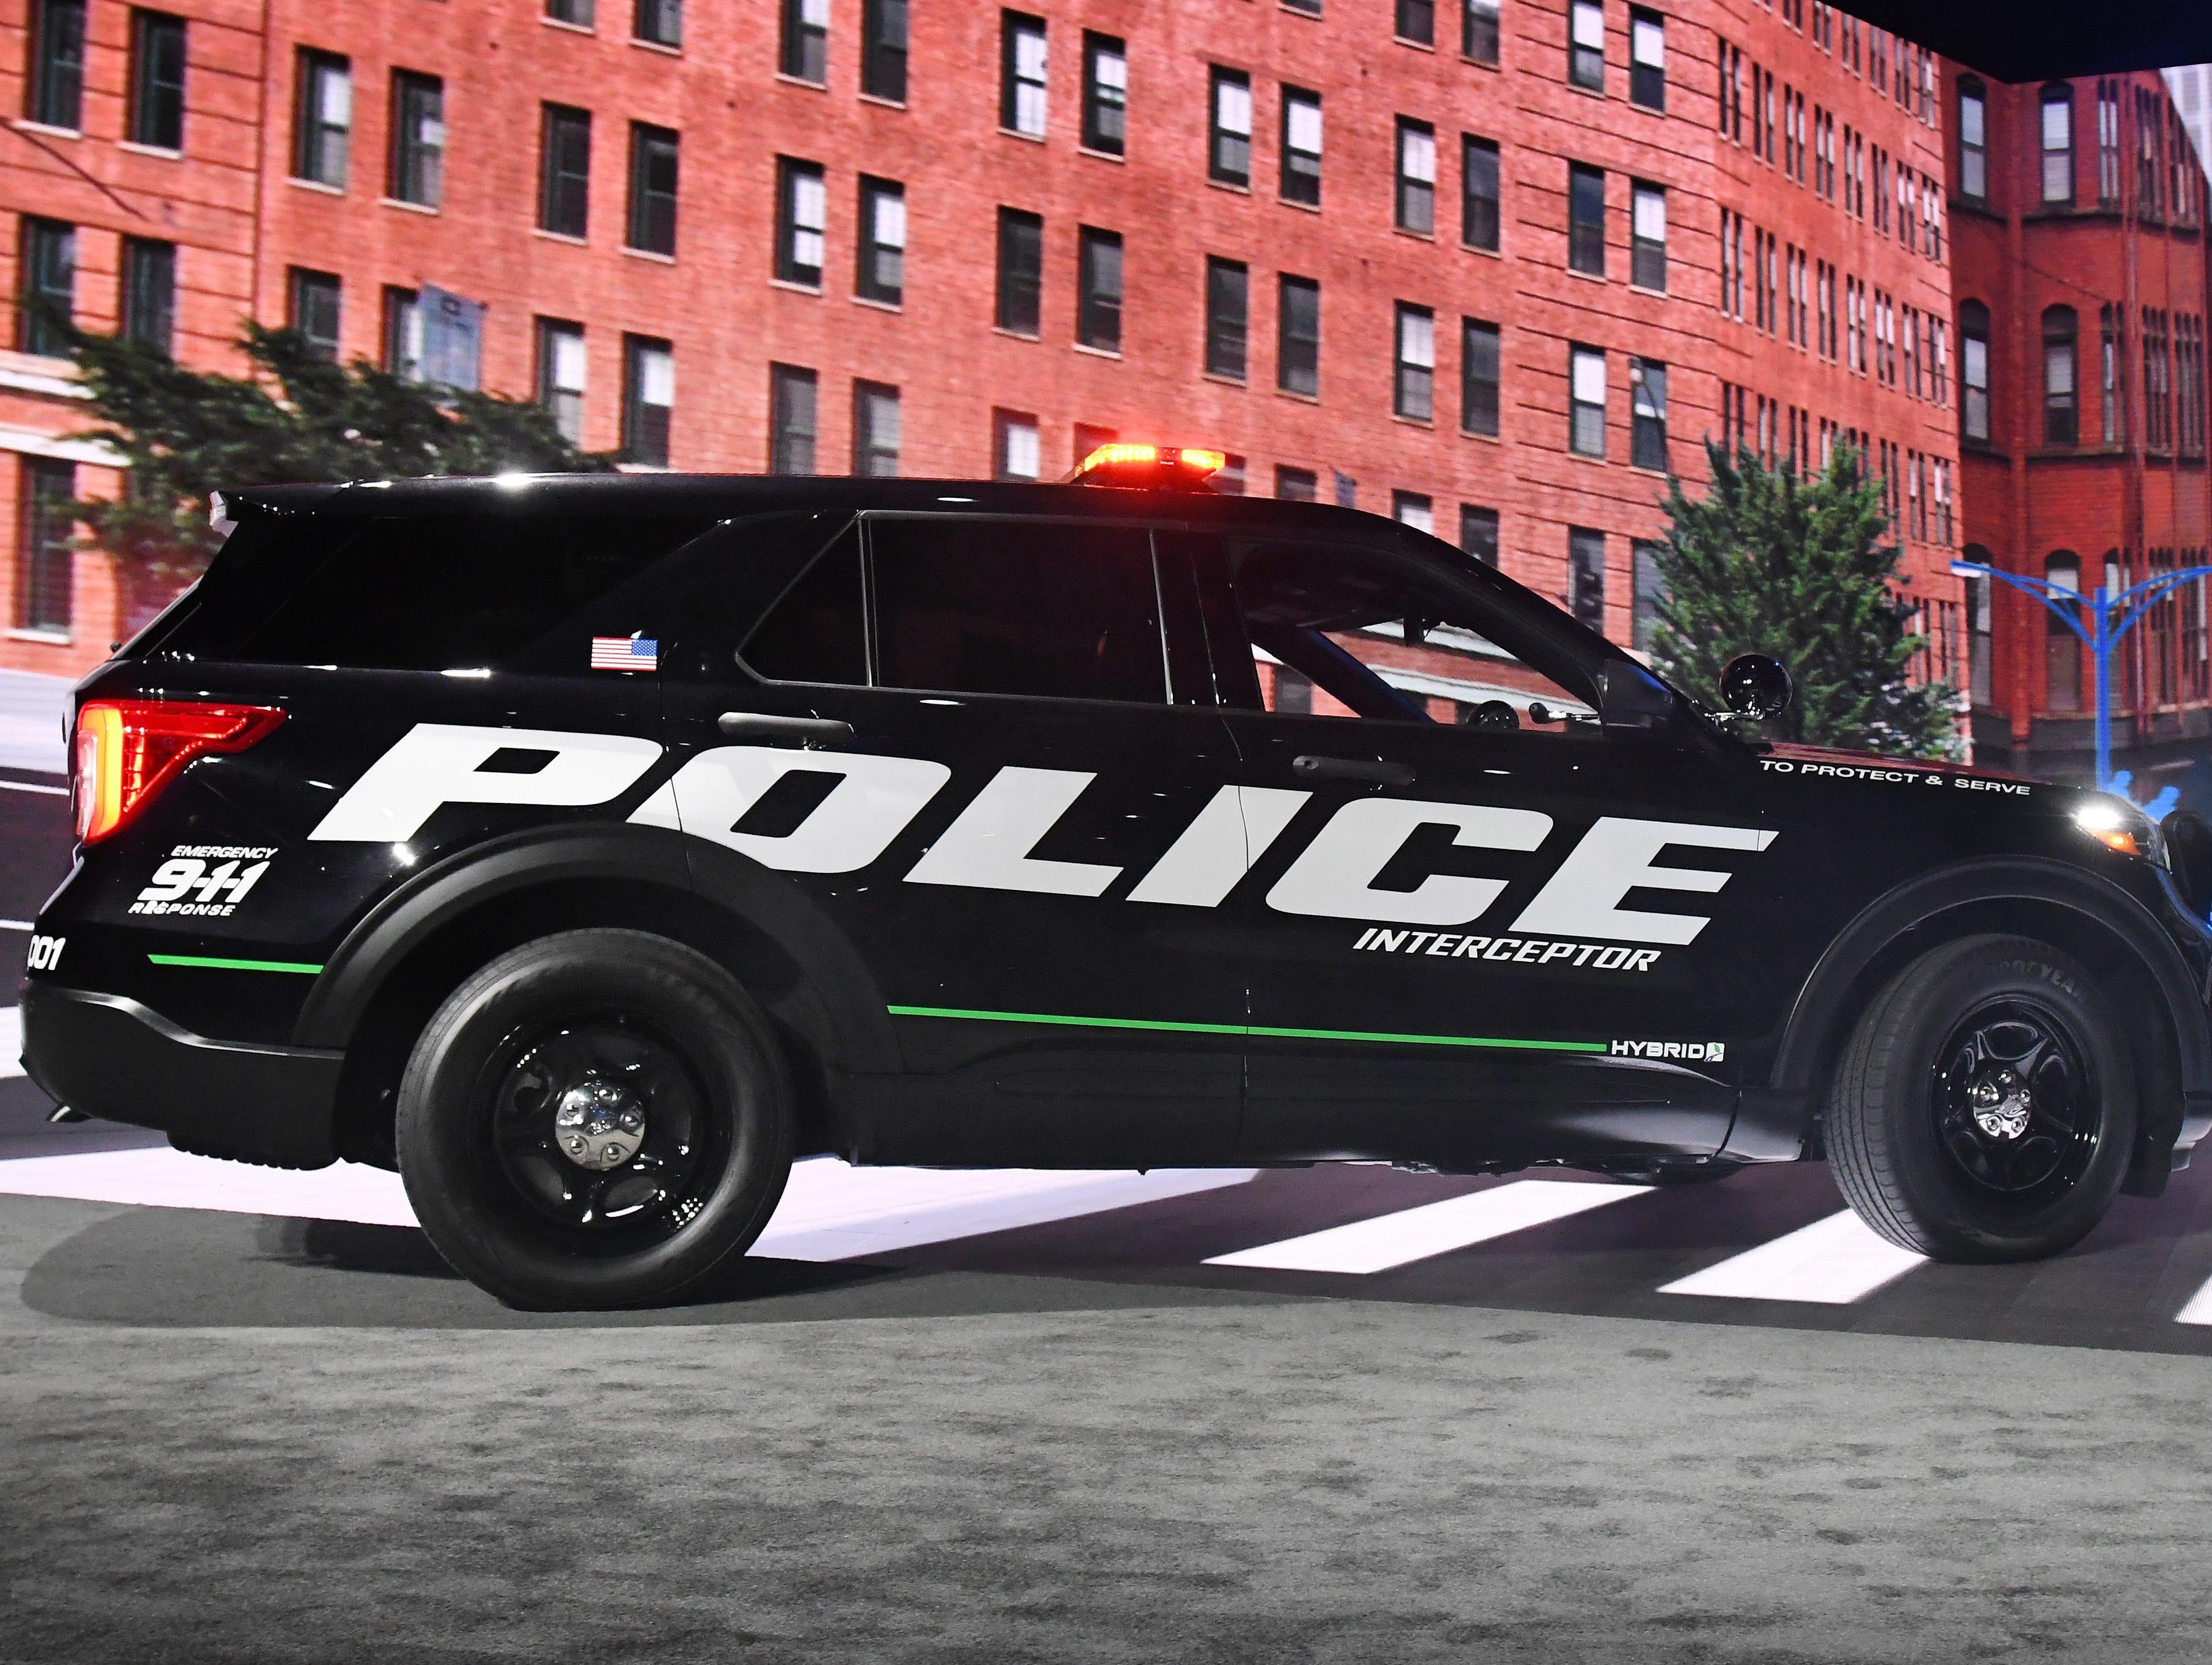 The new 2020 Ford Explorer Police Interceptor Utility hybrid.